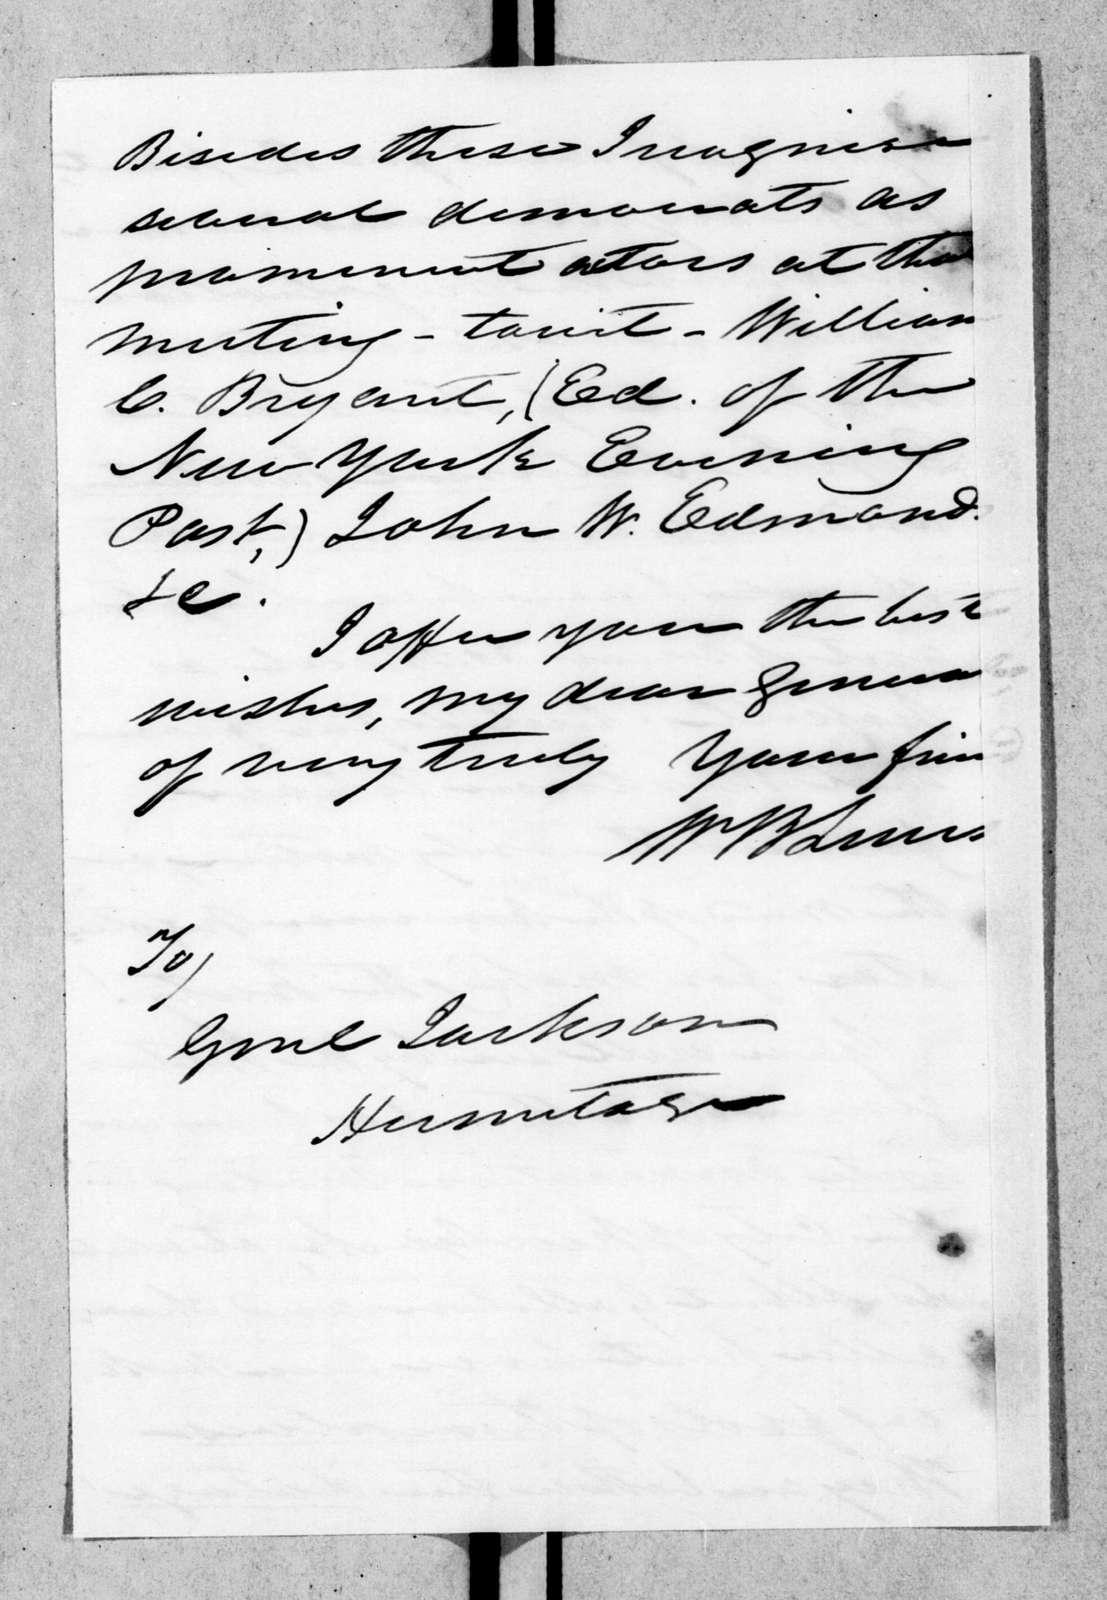 William Berkeley Lewis to Andrew Jackson, April 27, 1844